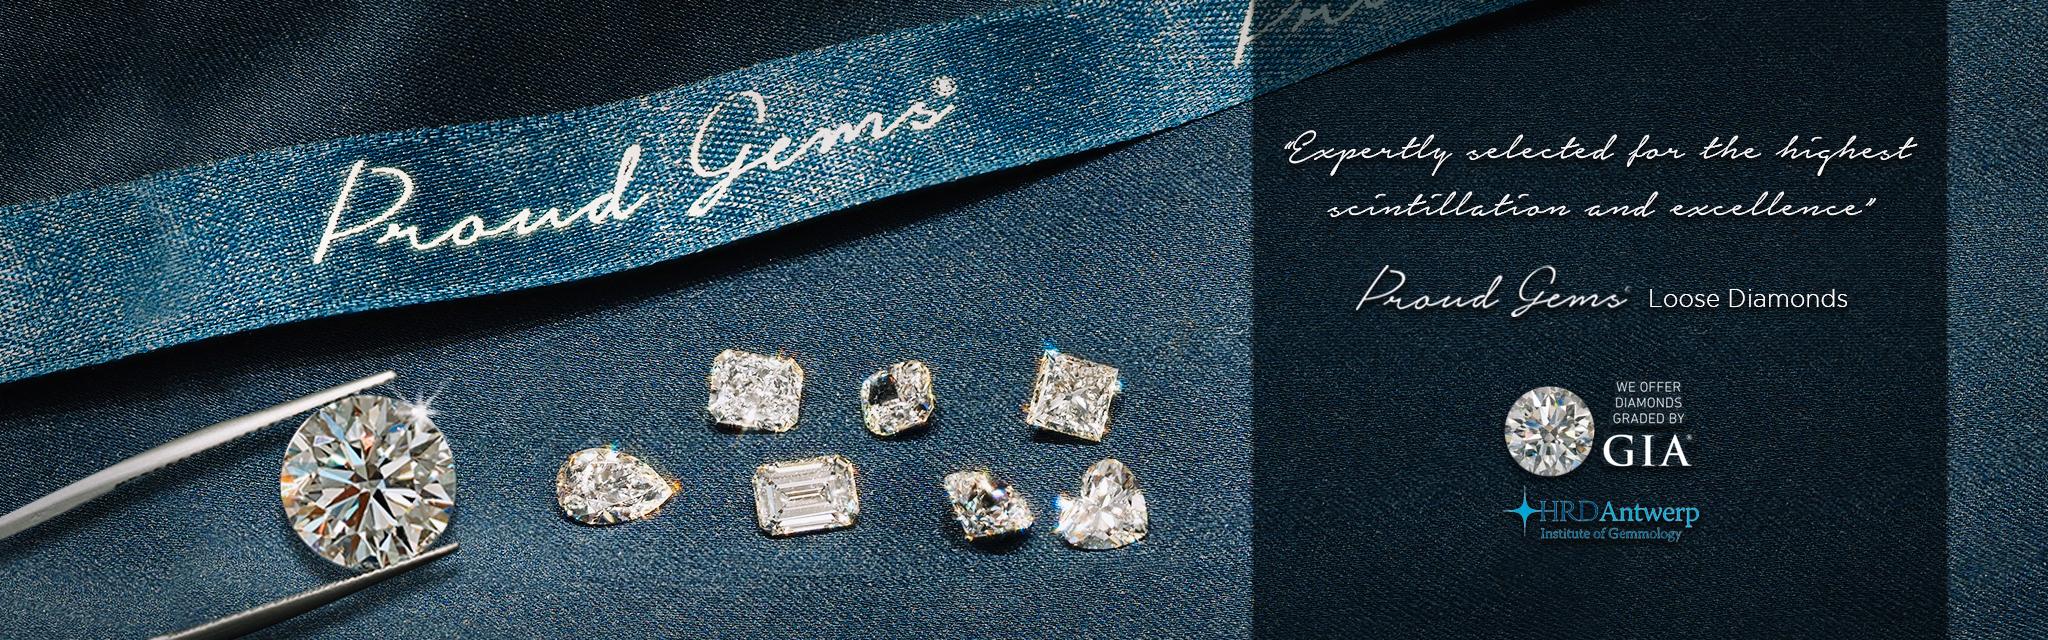 Loose Diamonds - Home